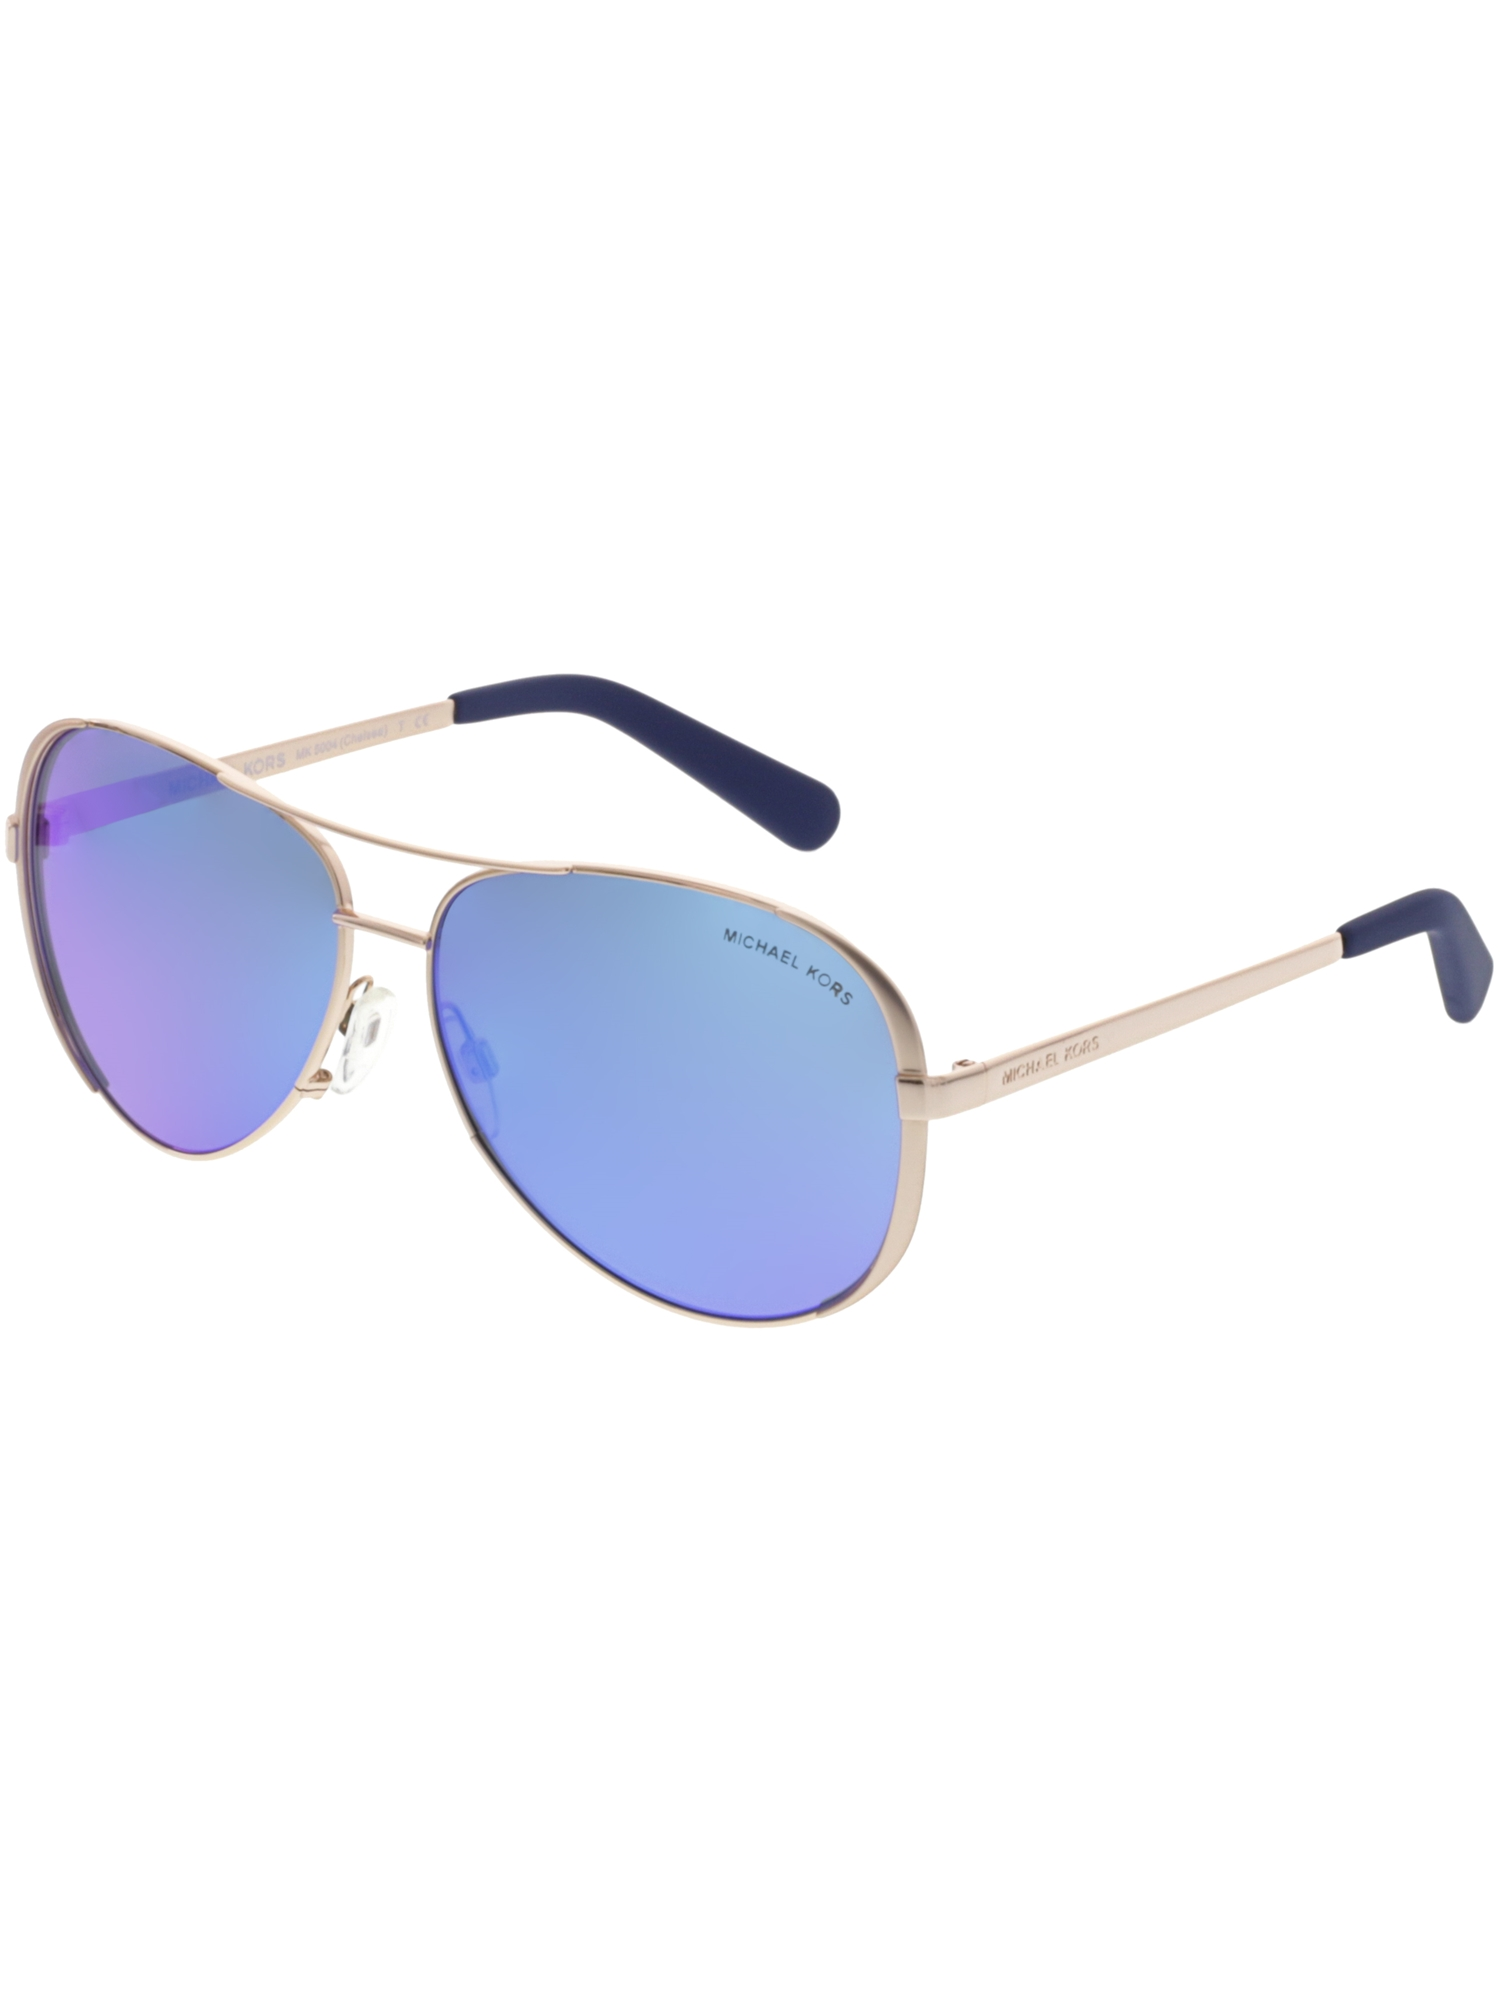 37d95fa72611 Michael Kors - Women's Gradient Chelsea MK5004-100325-59 Gold Aviator  Sunglasses - Walmart.com